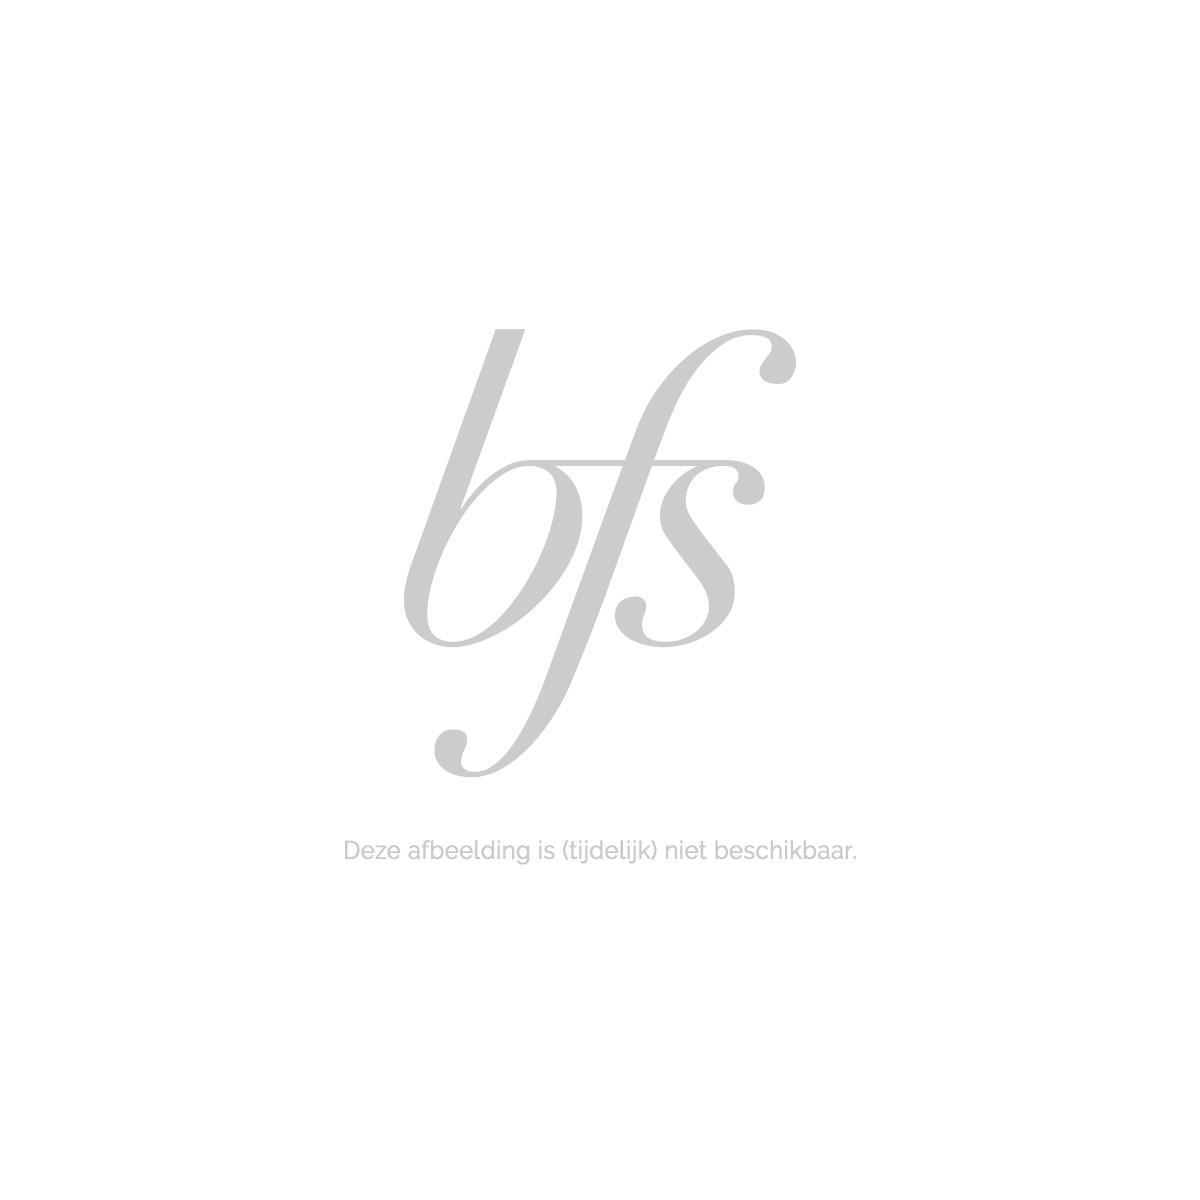 Yves Saint Laurent Mascara Volume Effet Faux Cils Luxurious Mascara